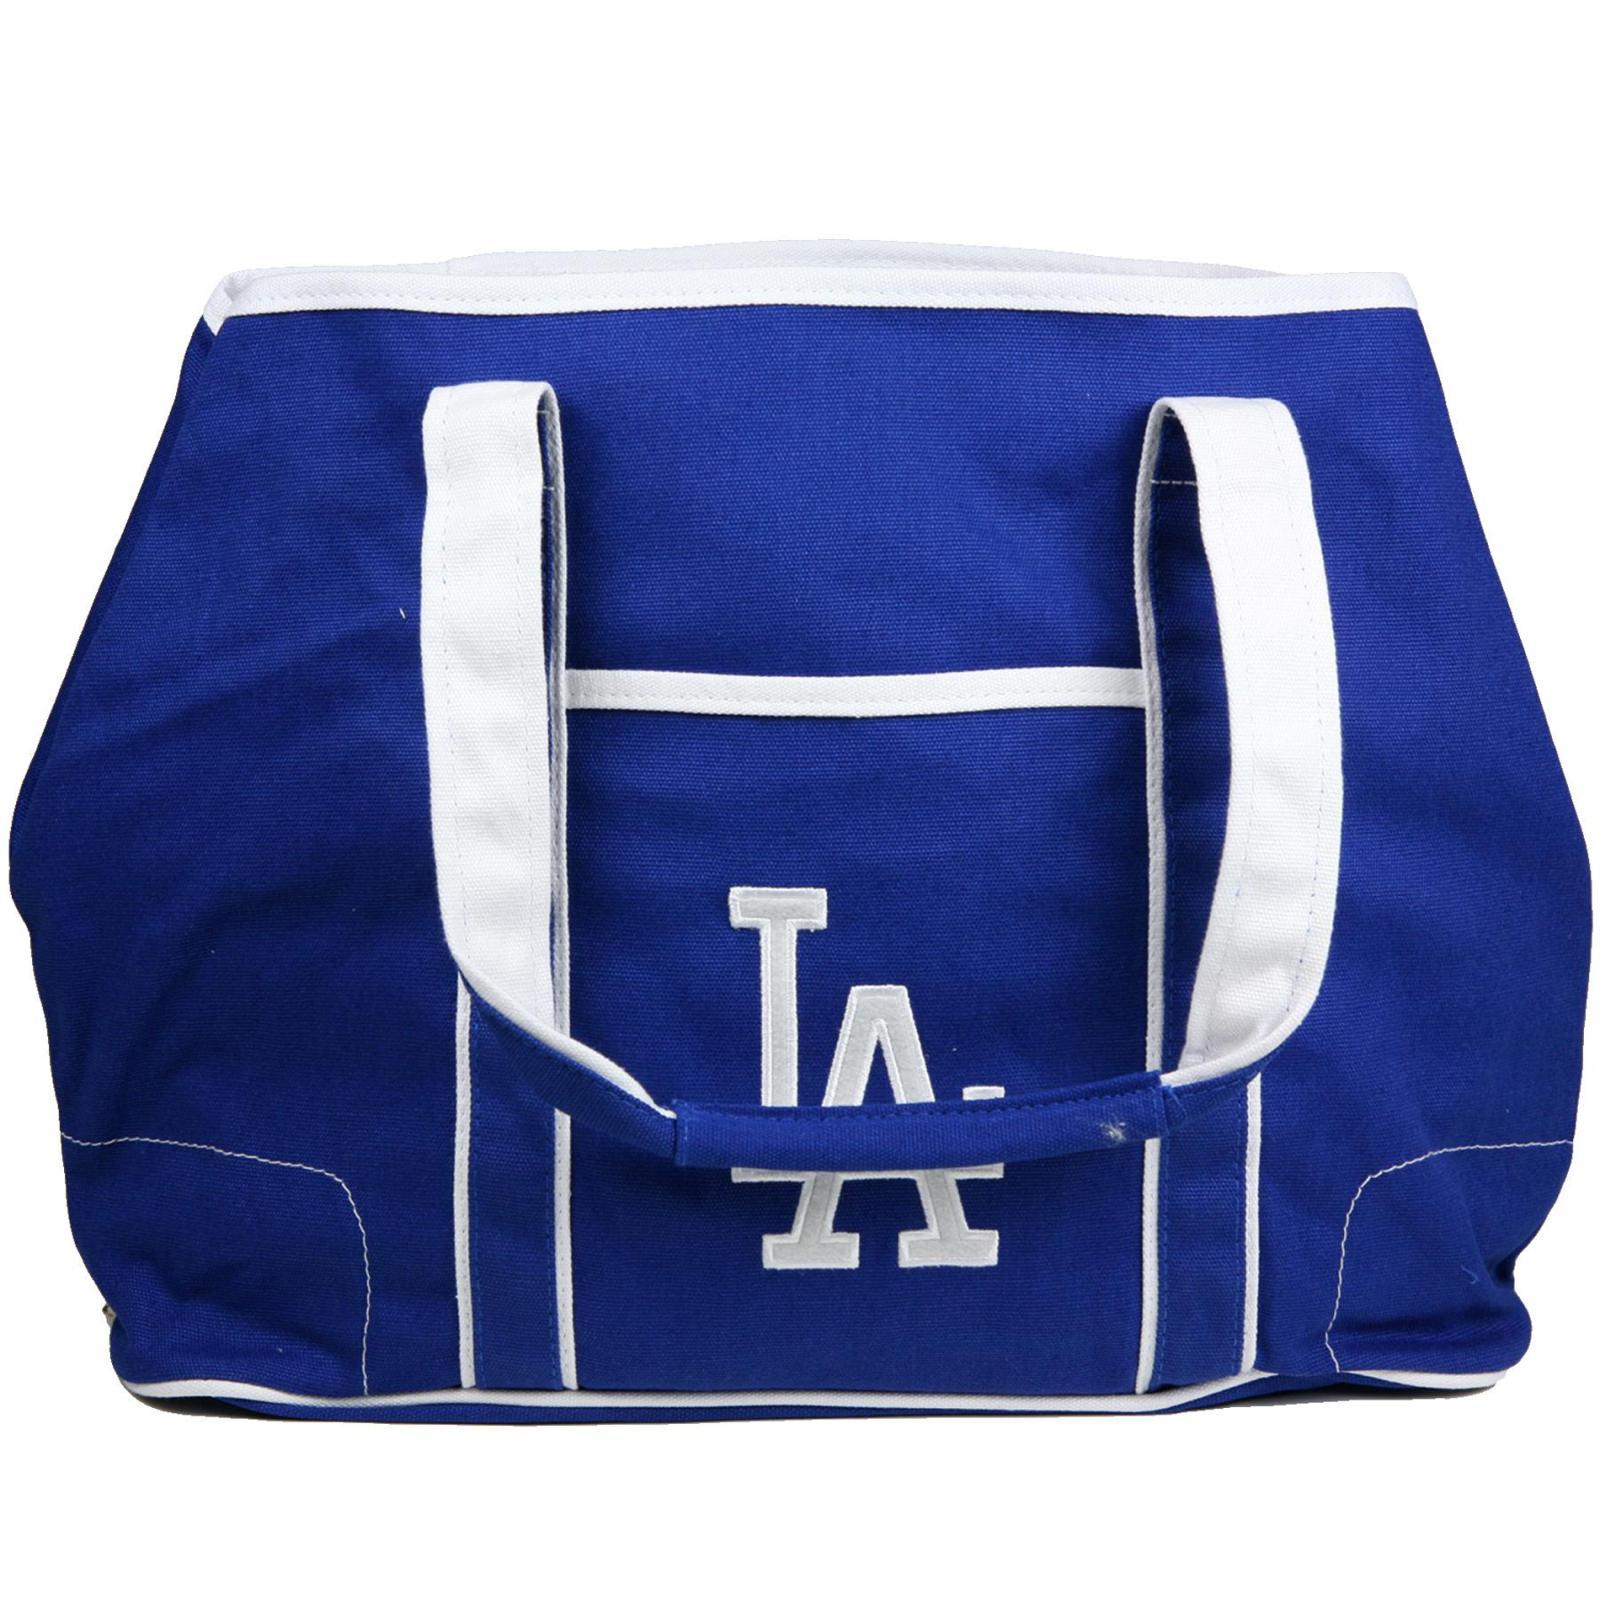 Los Angeles Dodgers Canvas Hampton Tote Bag